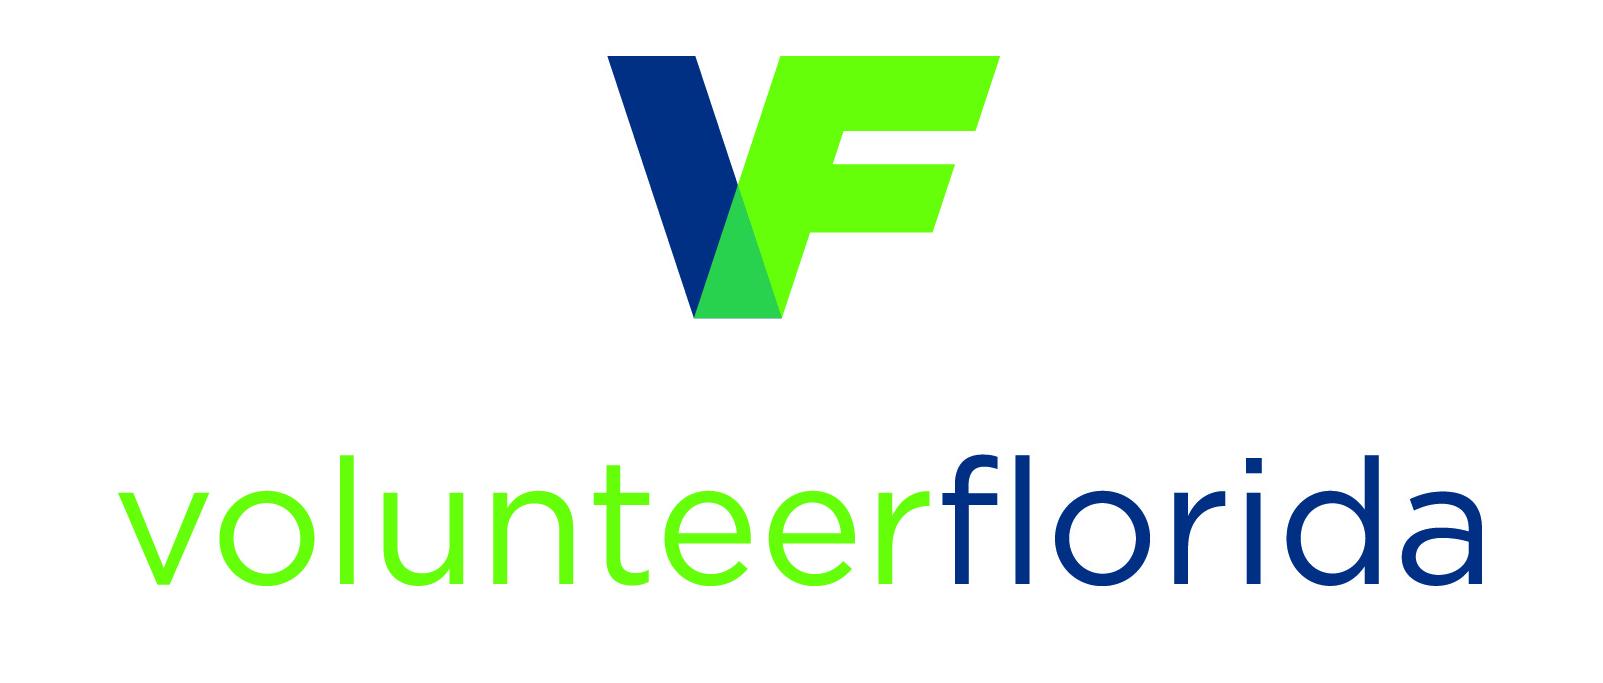 Volunteer Florida Logo